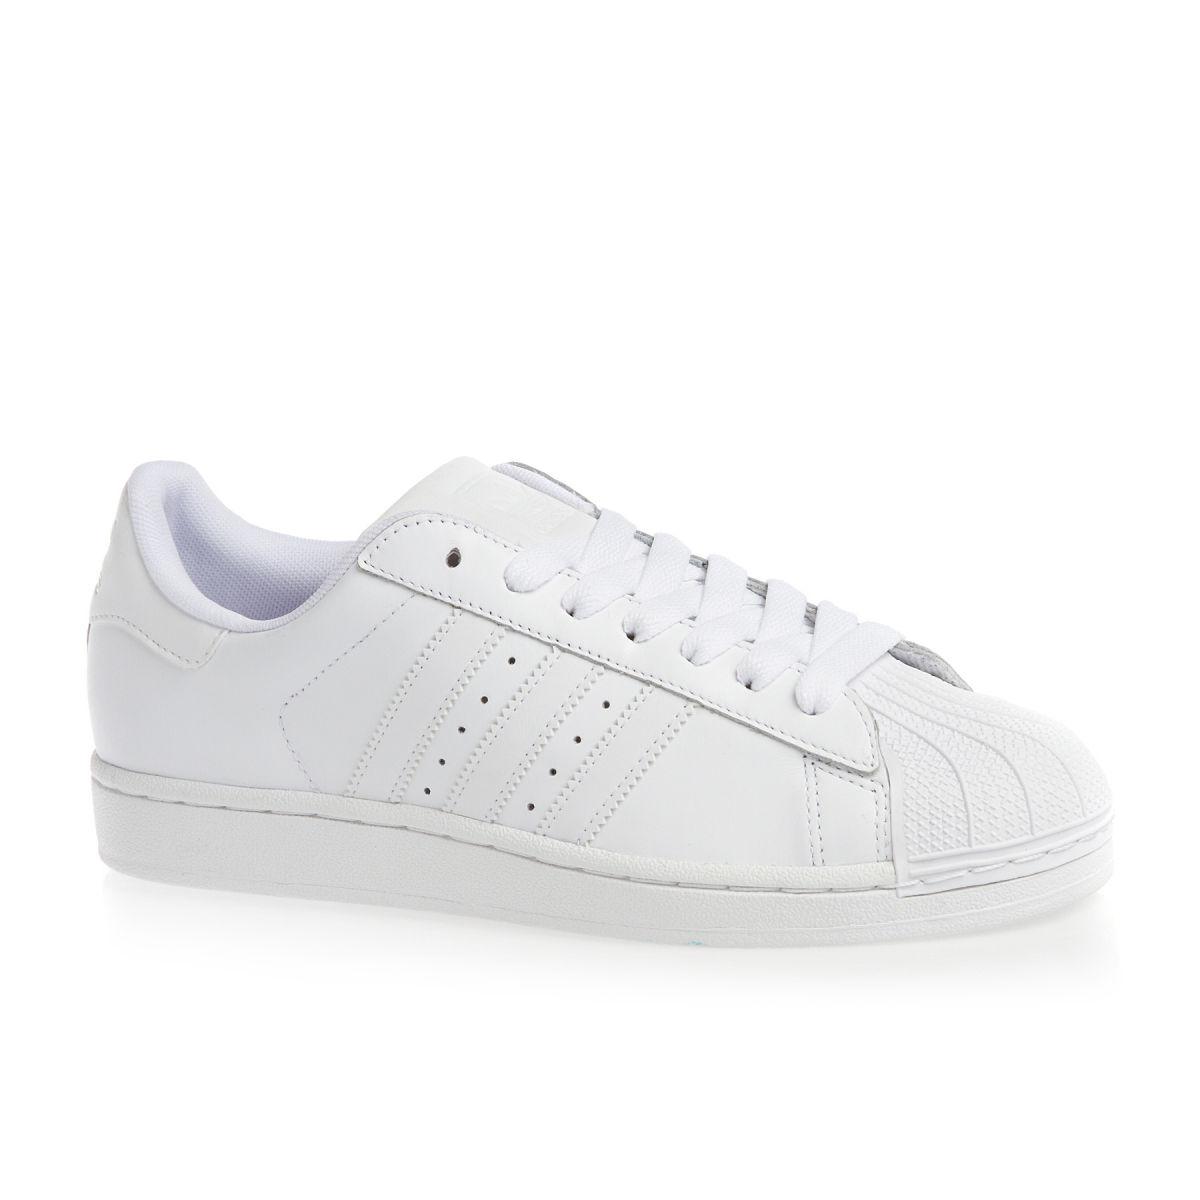 77ee1547dc9ad5 adidas-originals-shoes-adidas-originals-superstar-ii-shoes-